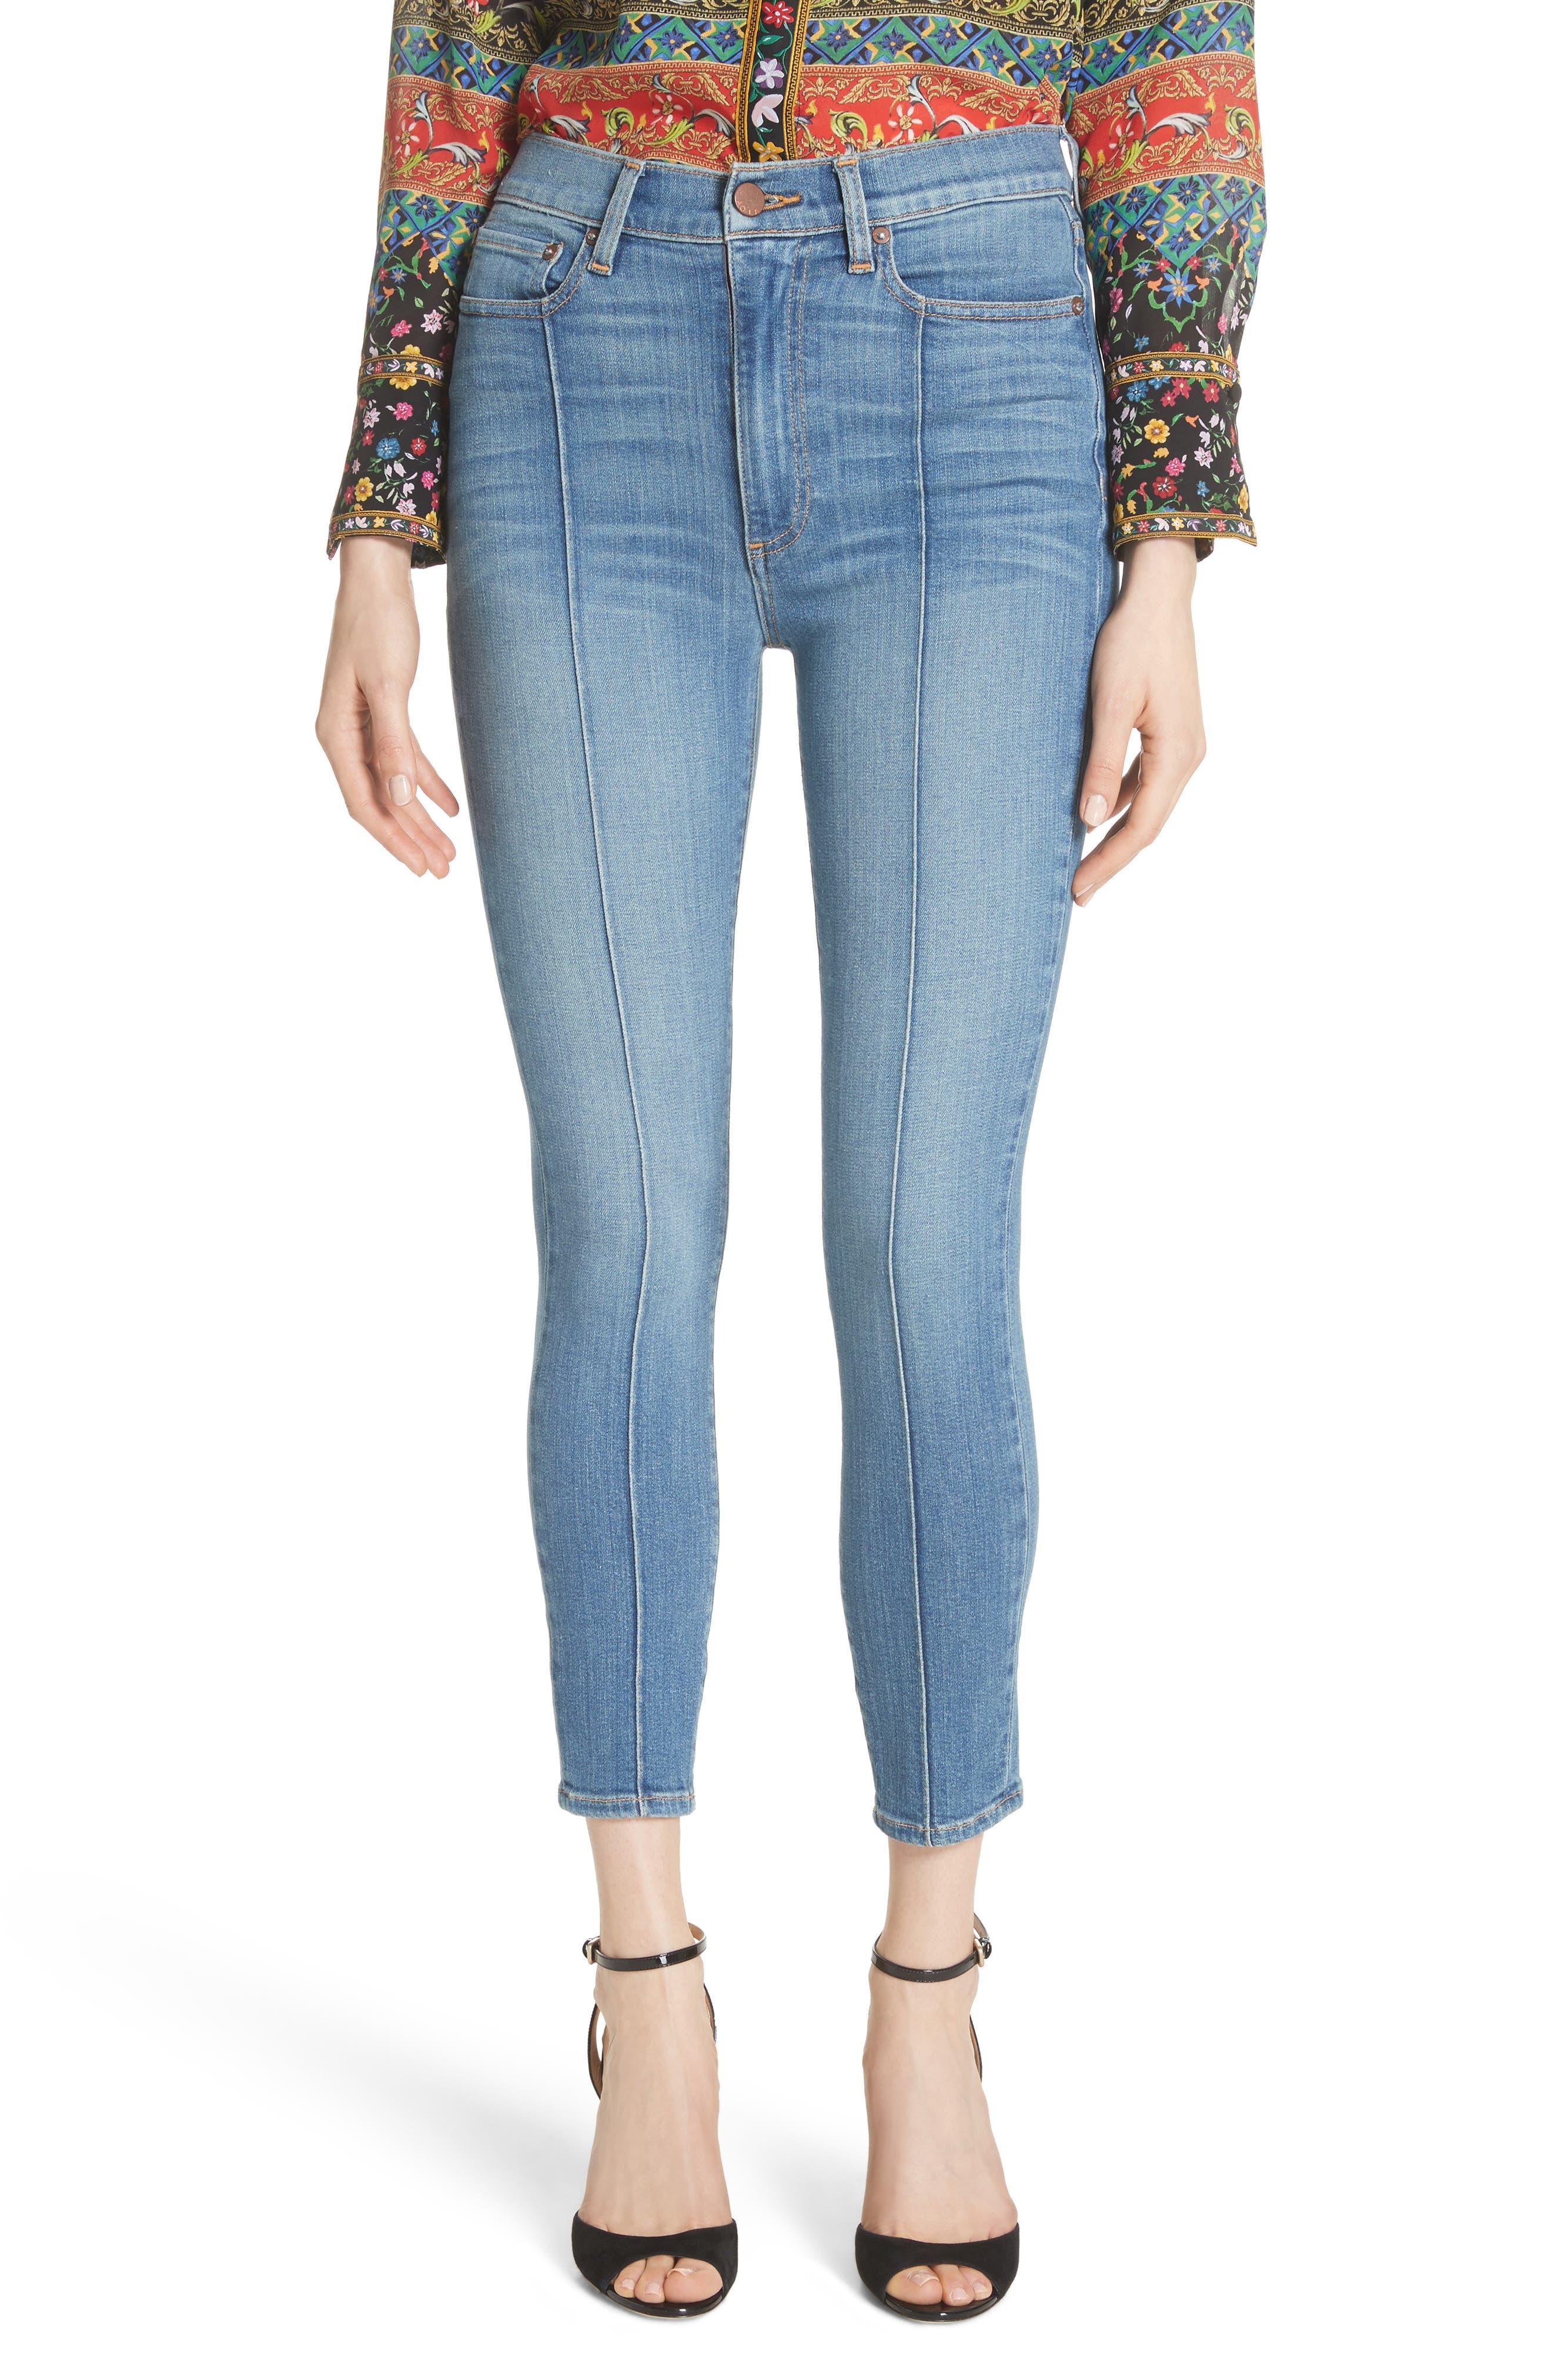 AO.LA Good High Waist Pintuck Skinny Jeans,                         Main,                         color, 482